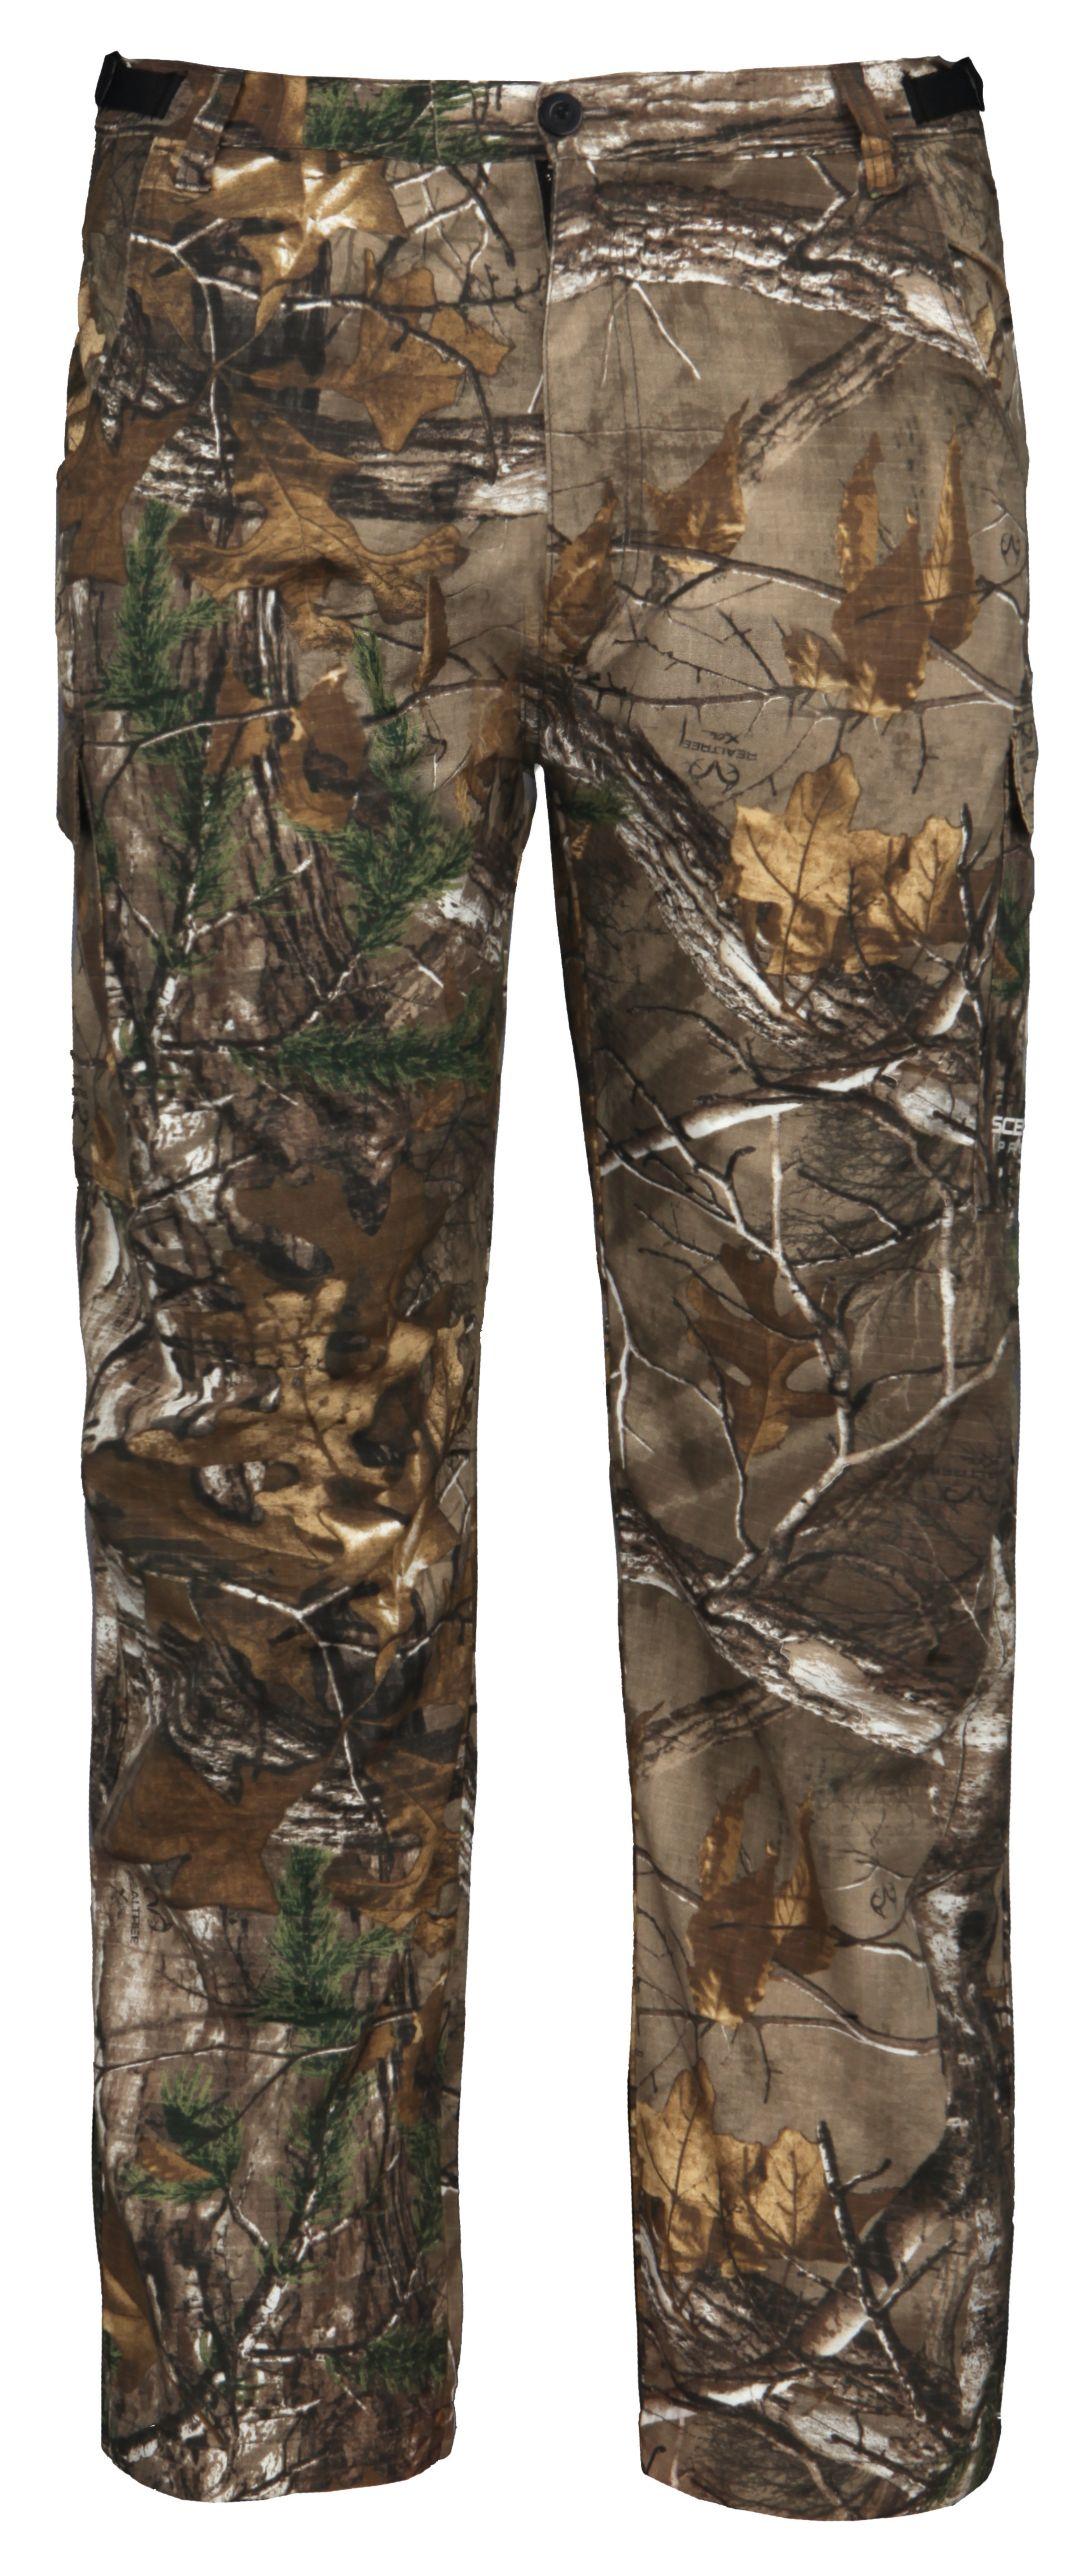 9773c607cdeac RealTree Men's Ripstop Hunting Pants | Field & Stream